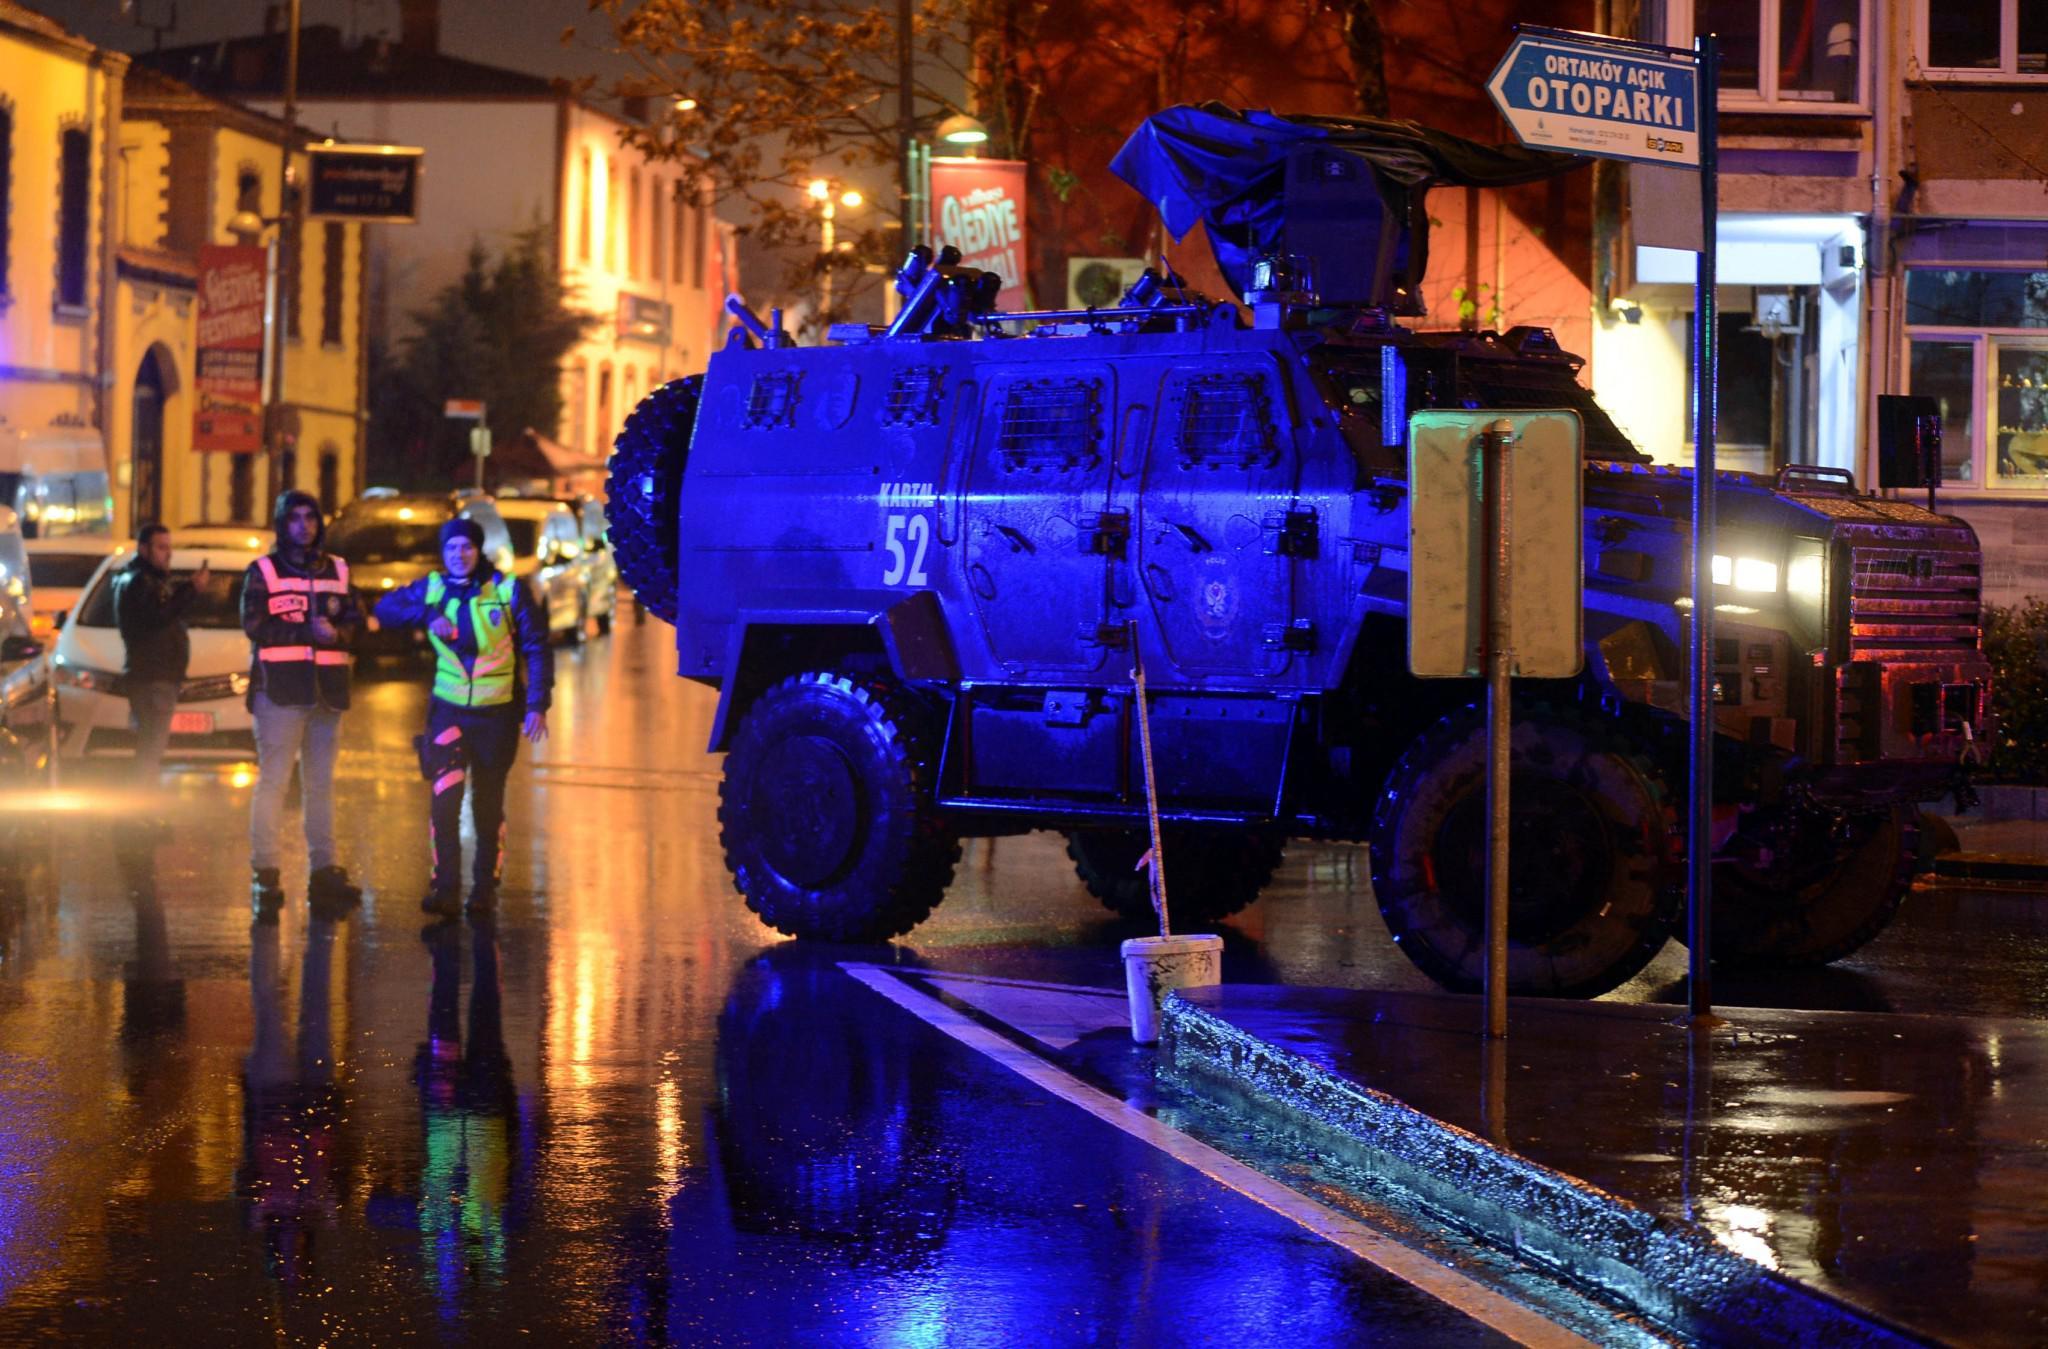 2017-01-01T000729Z_1150236699_RC1AA78E8390_RTRMADP_3_TURKEY-ATTACK Ανθρωποκυνηγητό για τον δράστη της επίθεσης στην Κωνσταντινούπολη